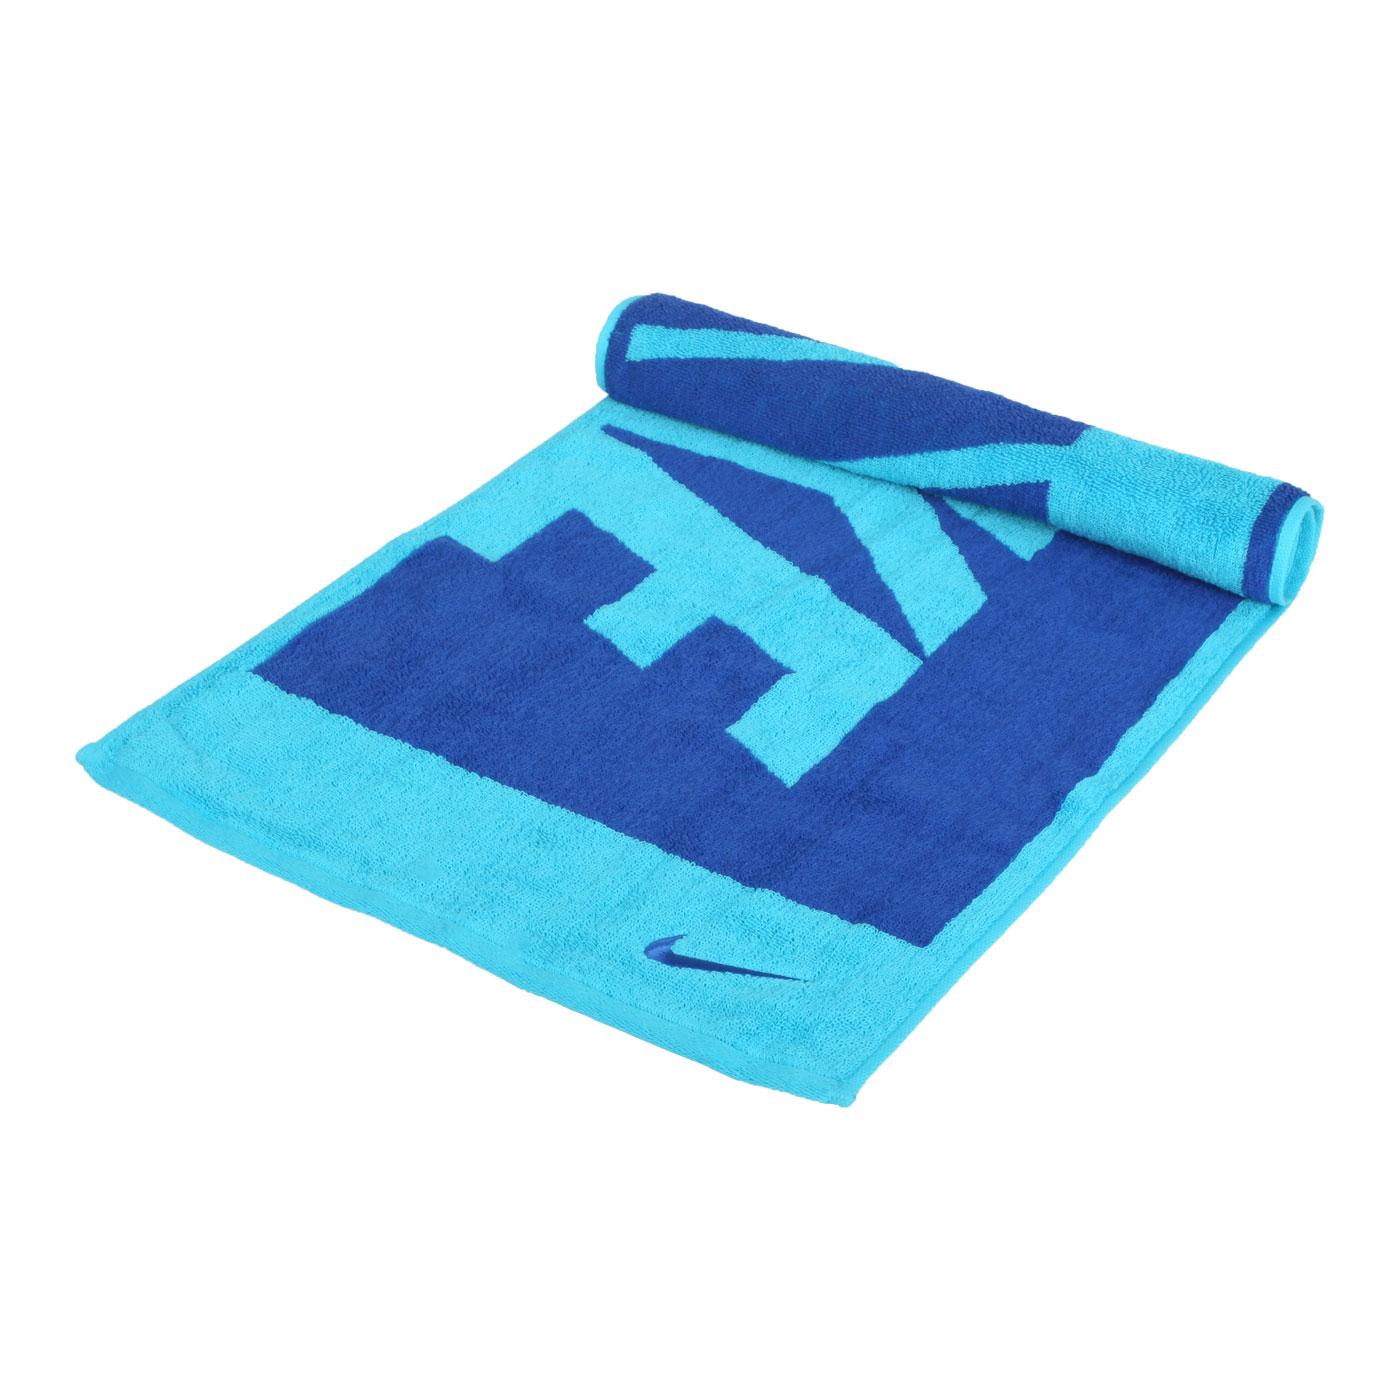 NIKE 長形毛巾(中) N1001539438MD - 藍水藍